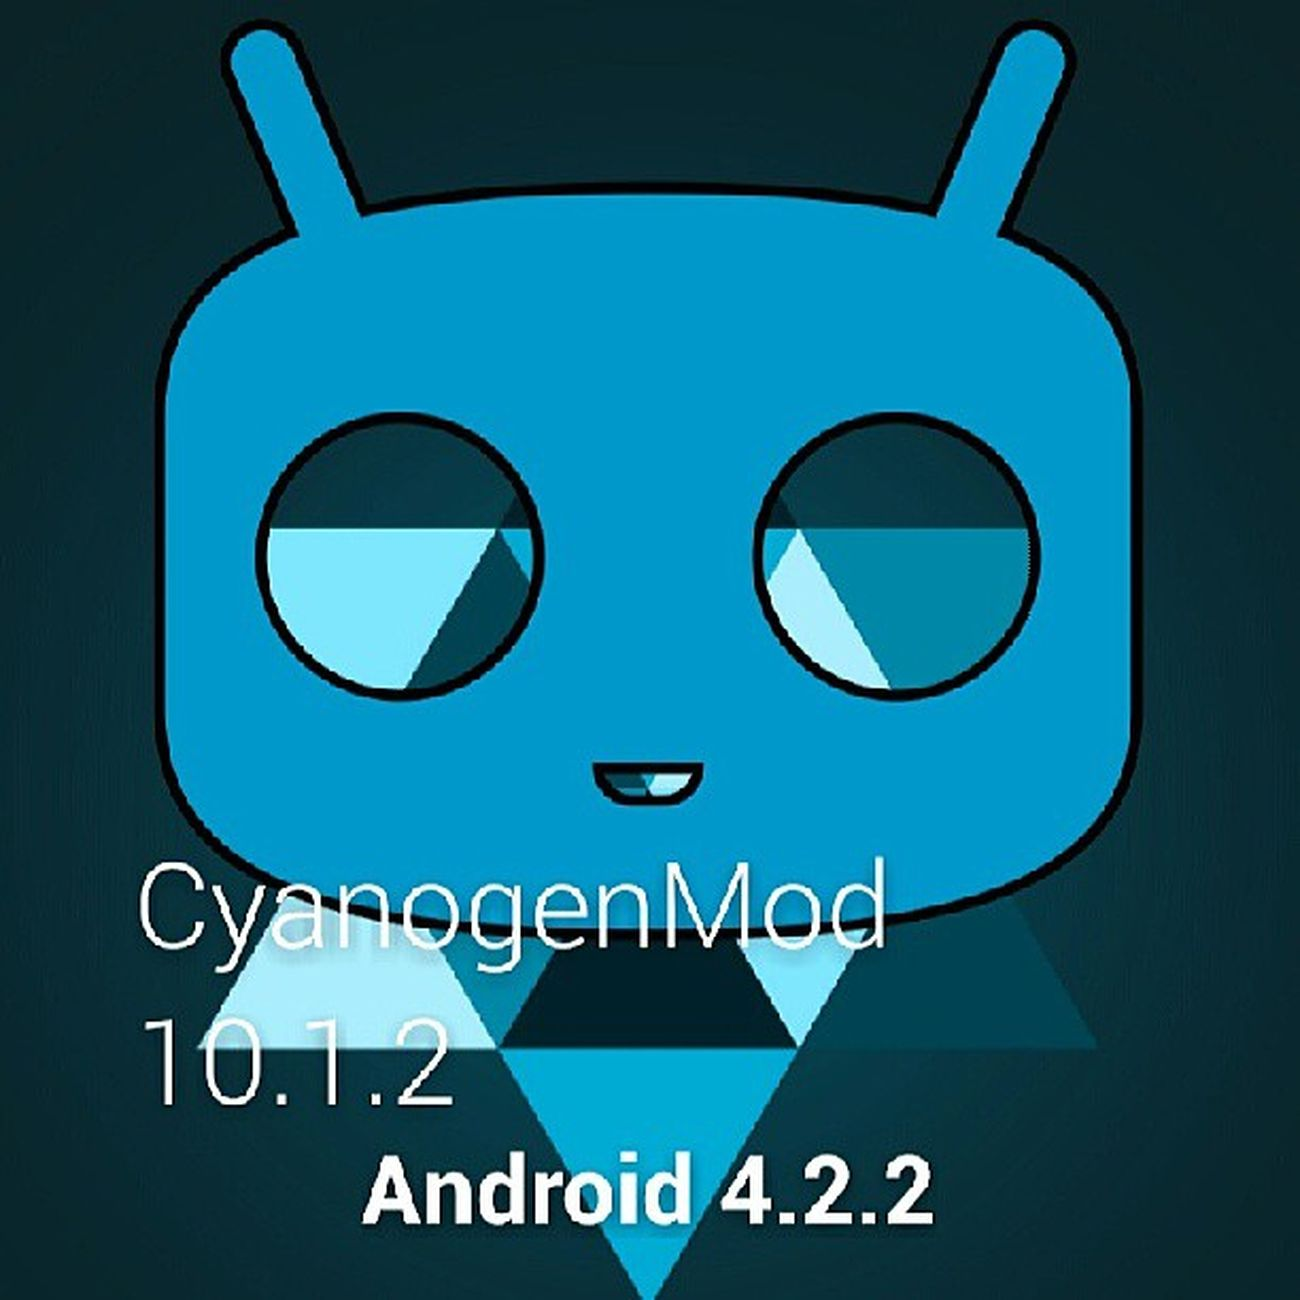 agora a coisa ficou daora Cyanogenmod